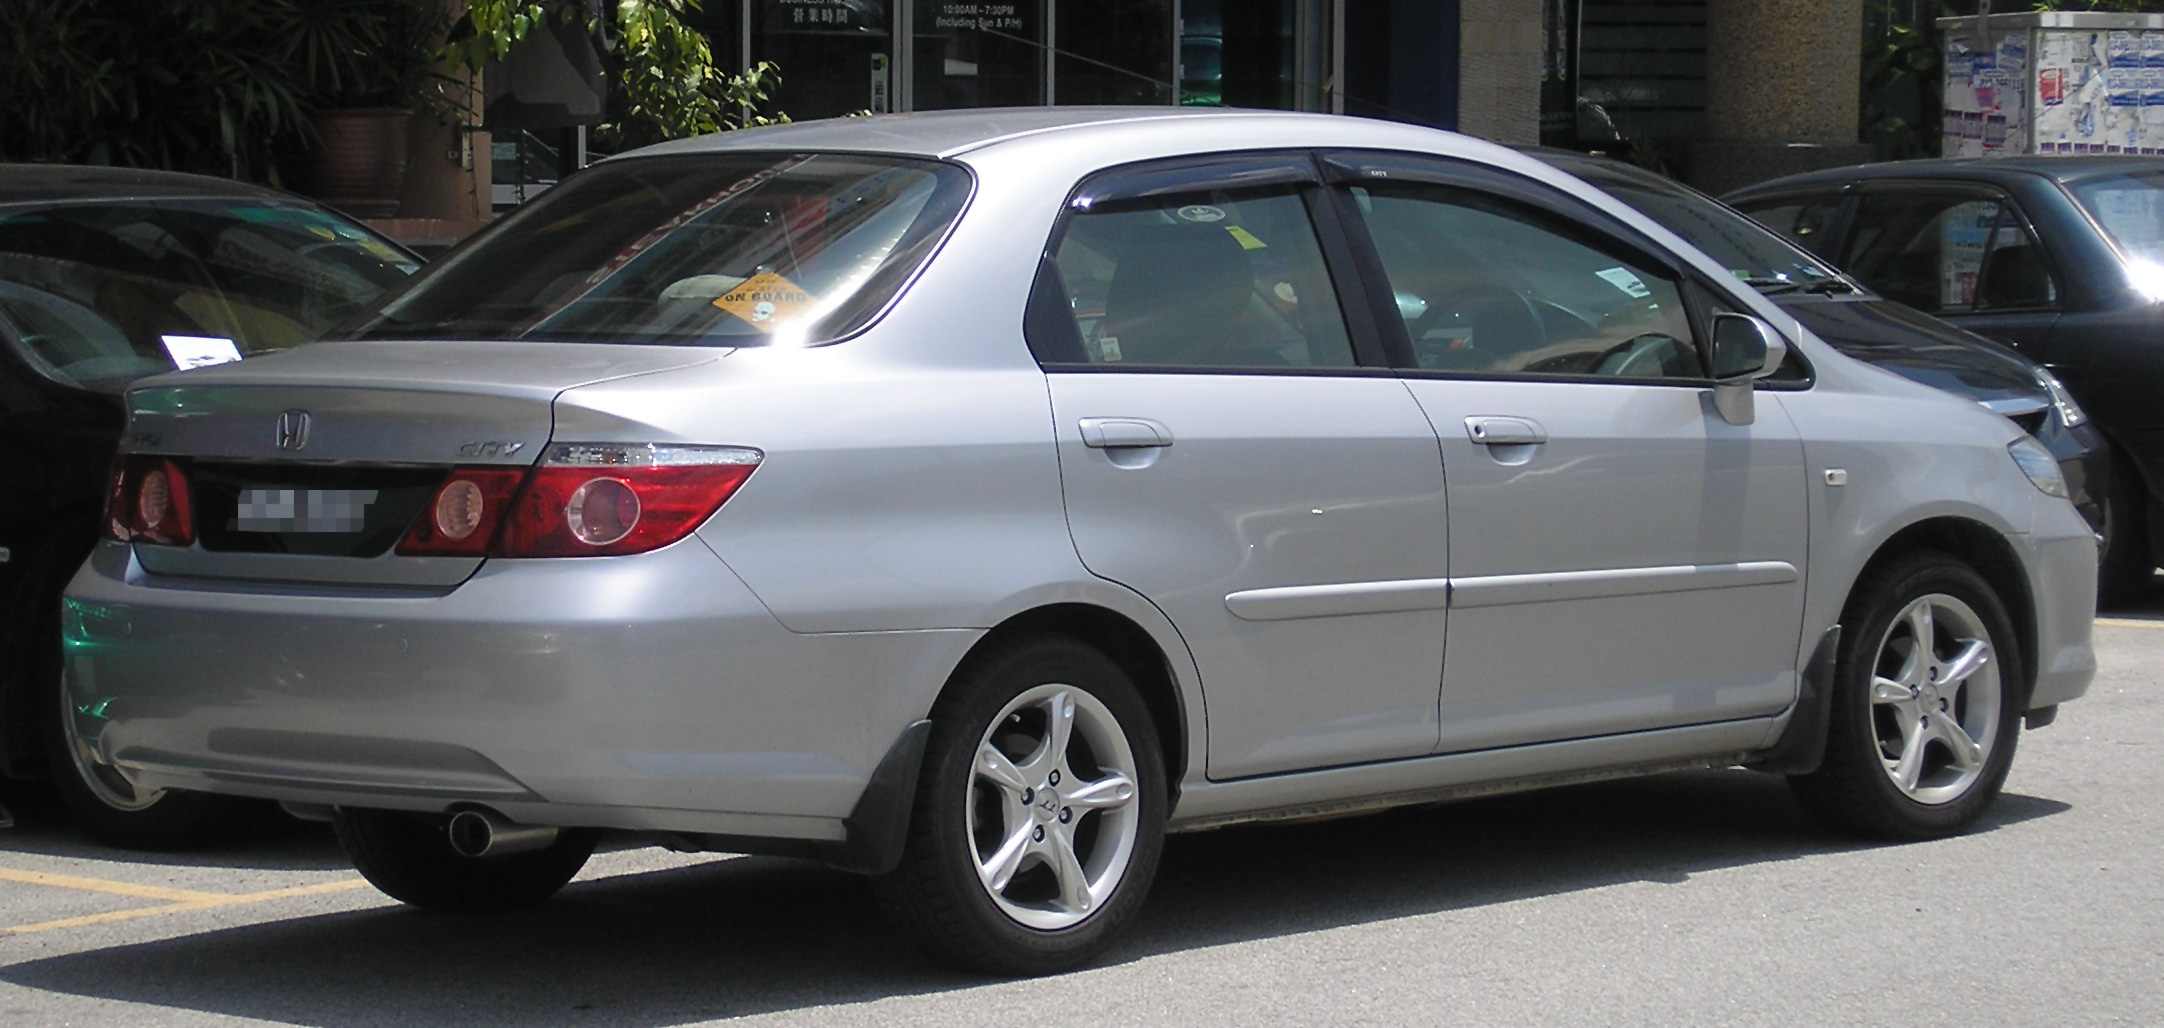 (IMG:http://upload.wikimedia.org/wikipedia/commons/8/80/Honda_City_(fourth_generation,_first_facelift)_(rear),_Serdang.jpg)